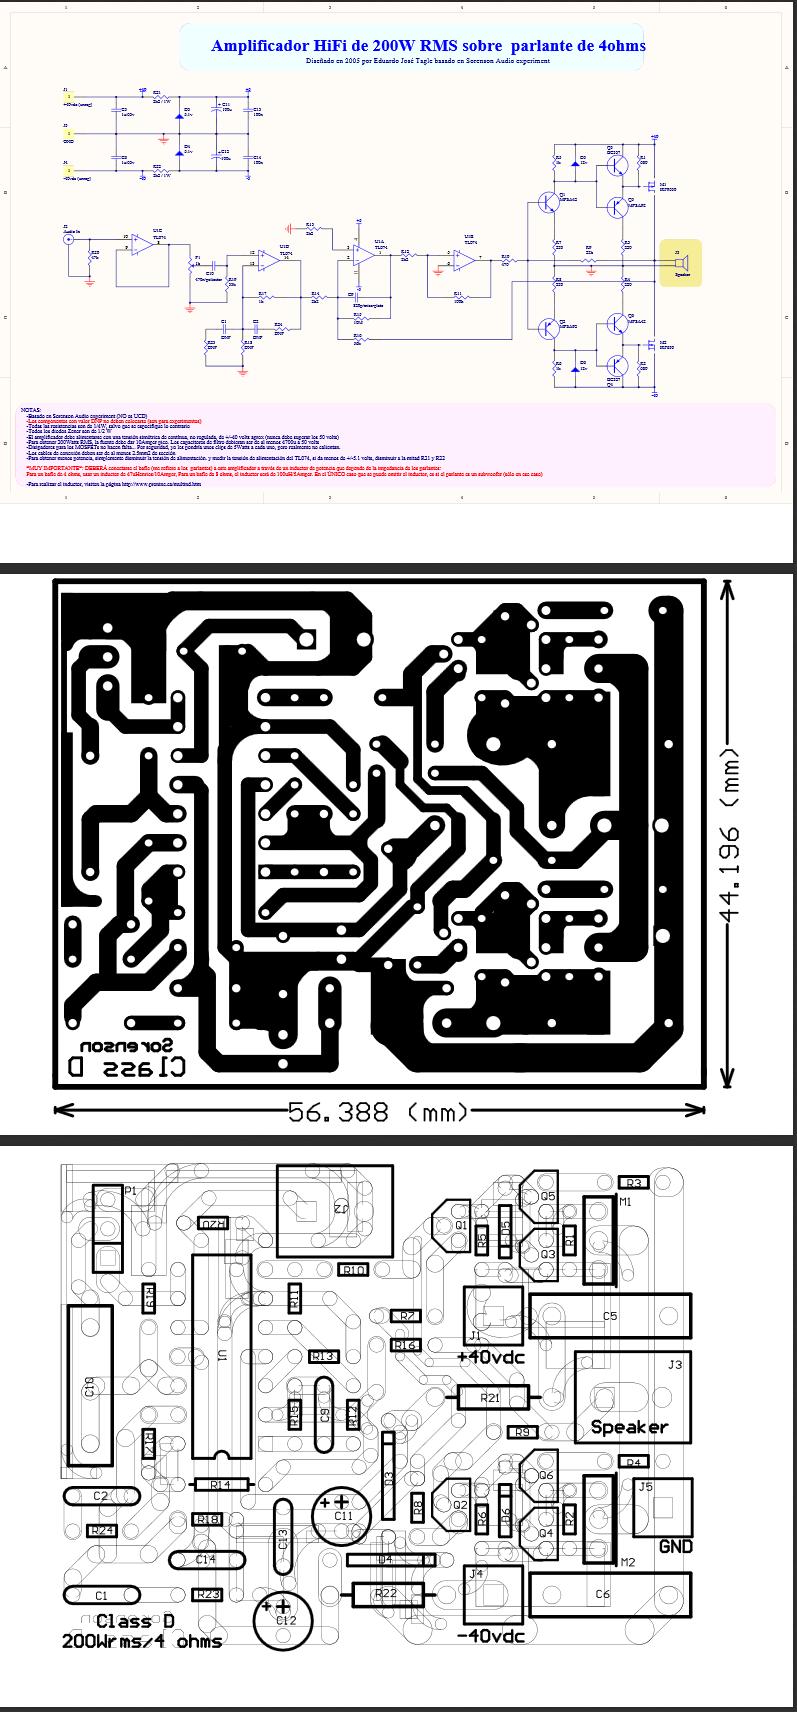 CARA PDF DI KOMPUTERY EPUB